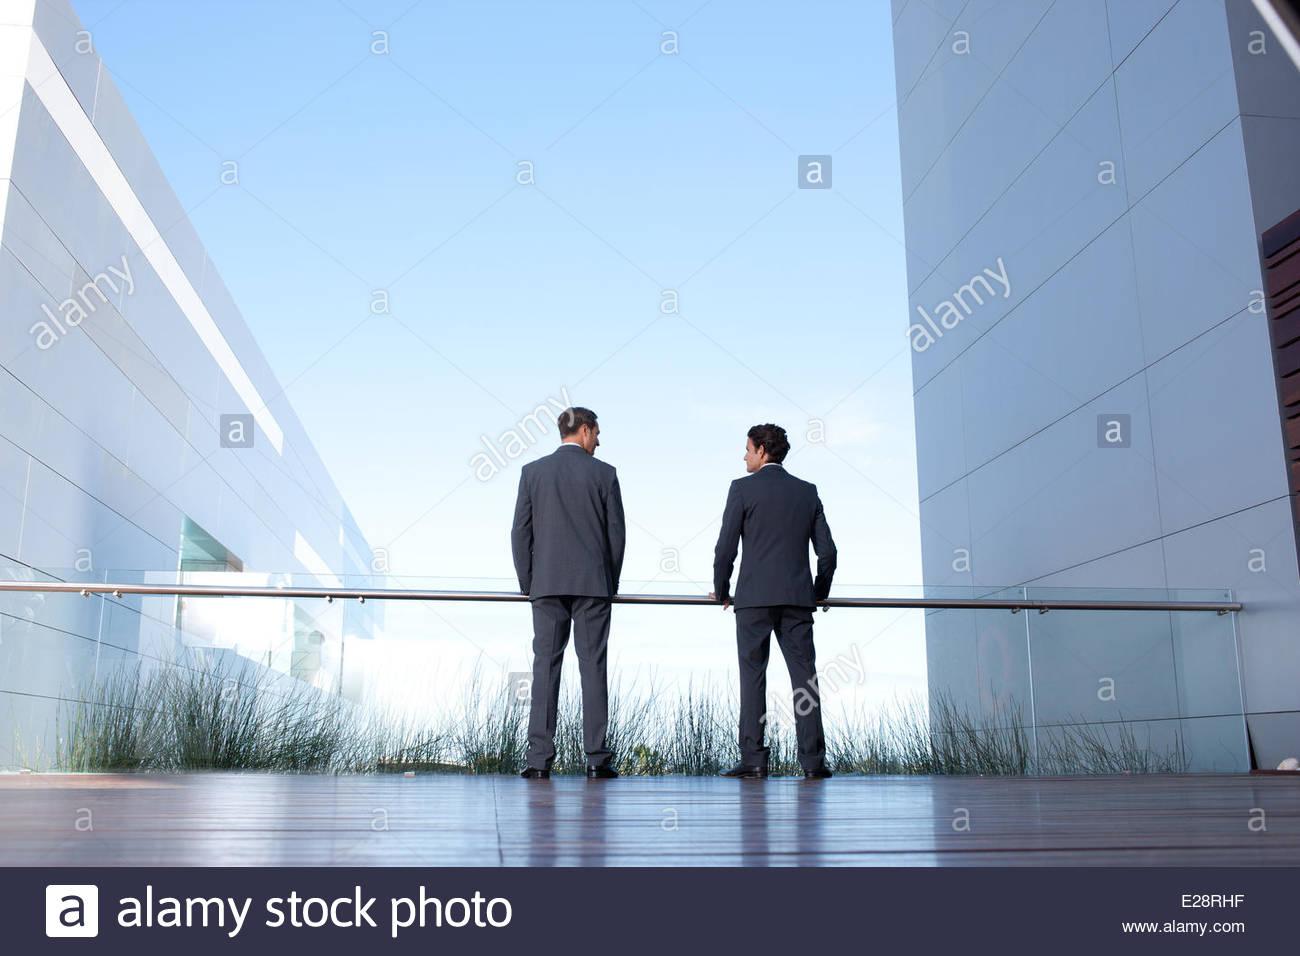 Businessmen standing on balcony - Stock Image